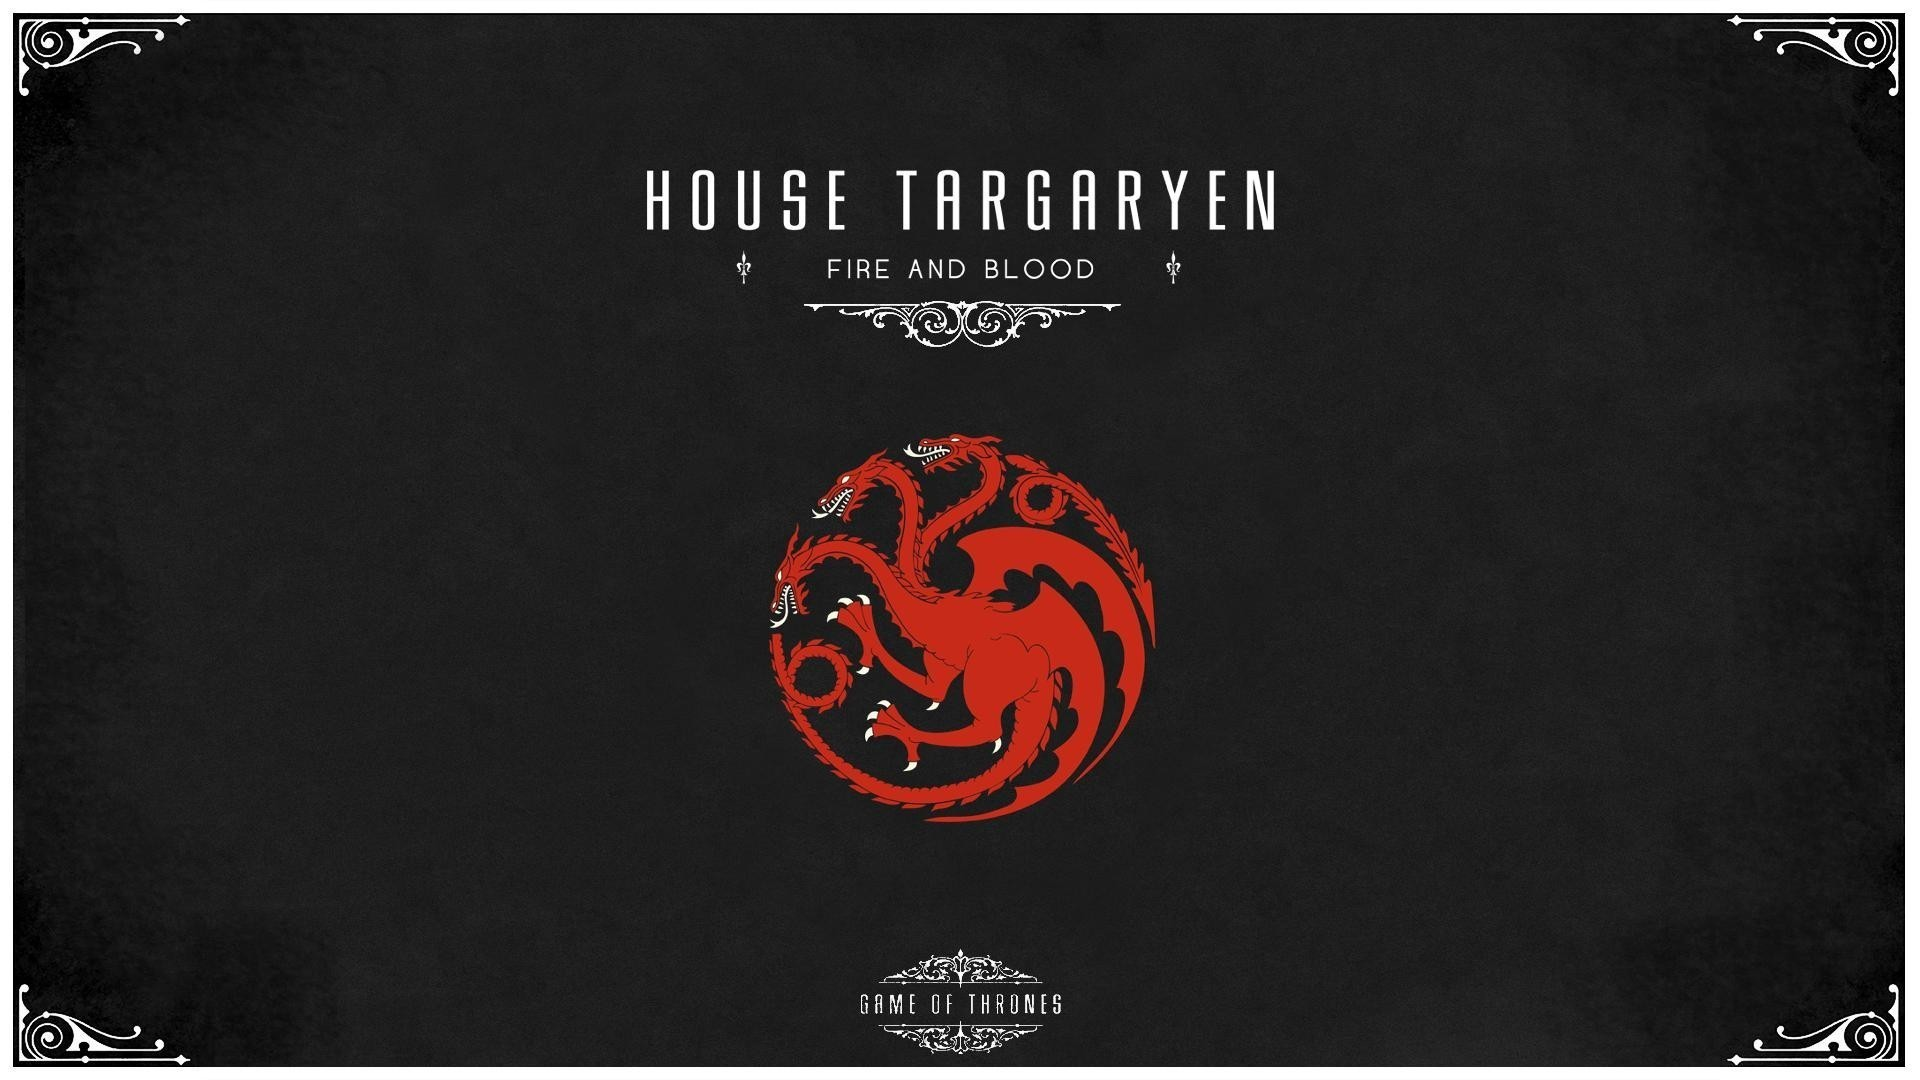 Game of thrones house targaryen wallpaper